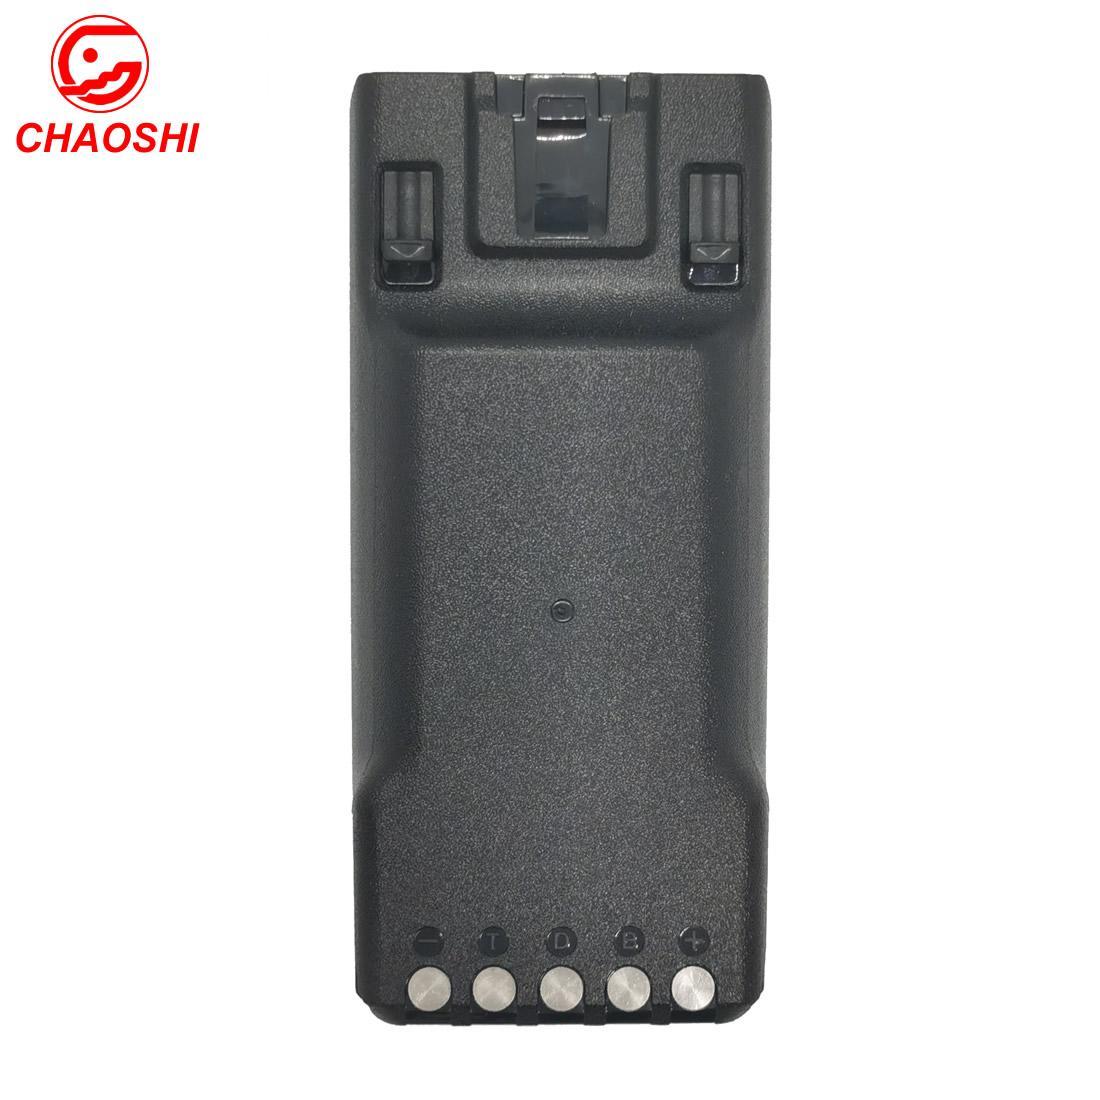 BP284對講機電池 IC-F3400D, IC-F4400D, IC-F70 1